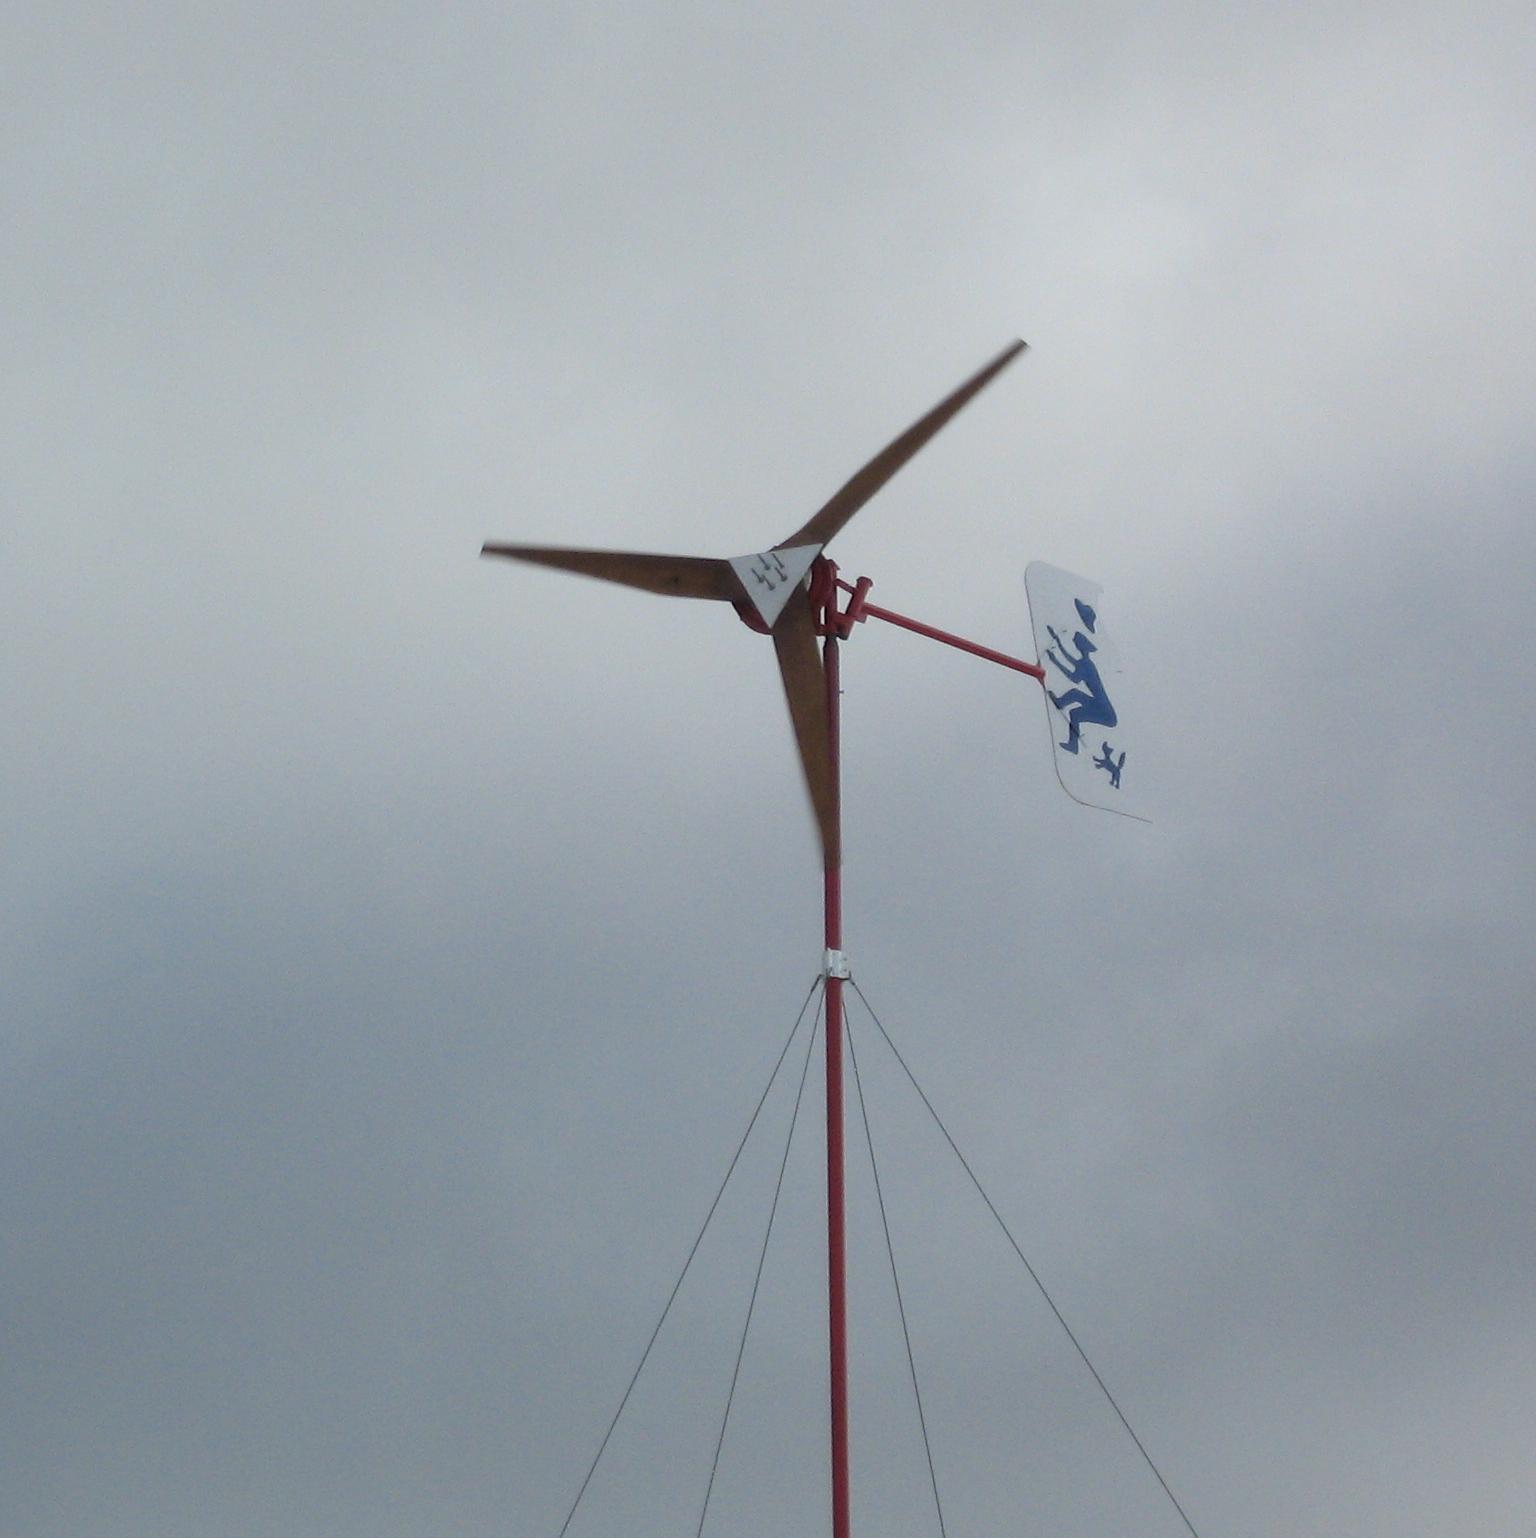 knowlesville_turbine_2009-1